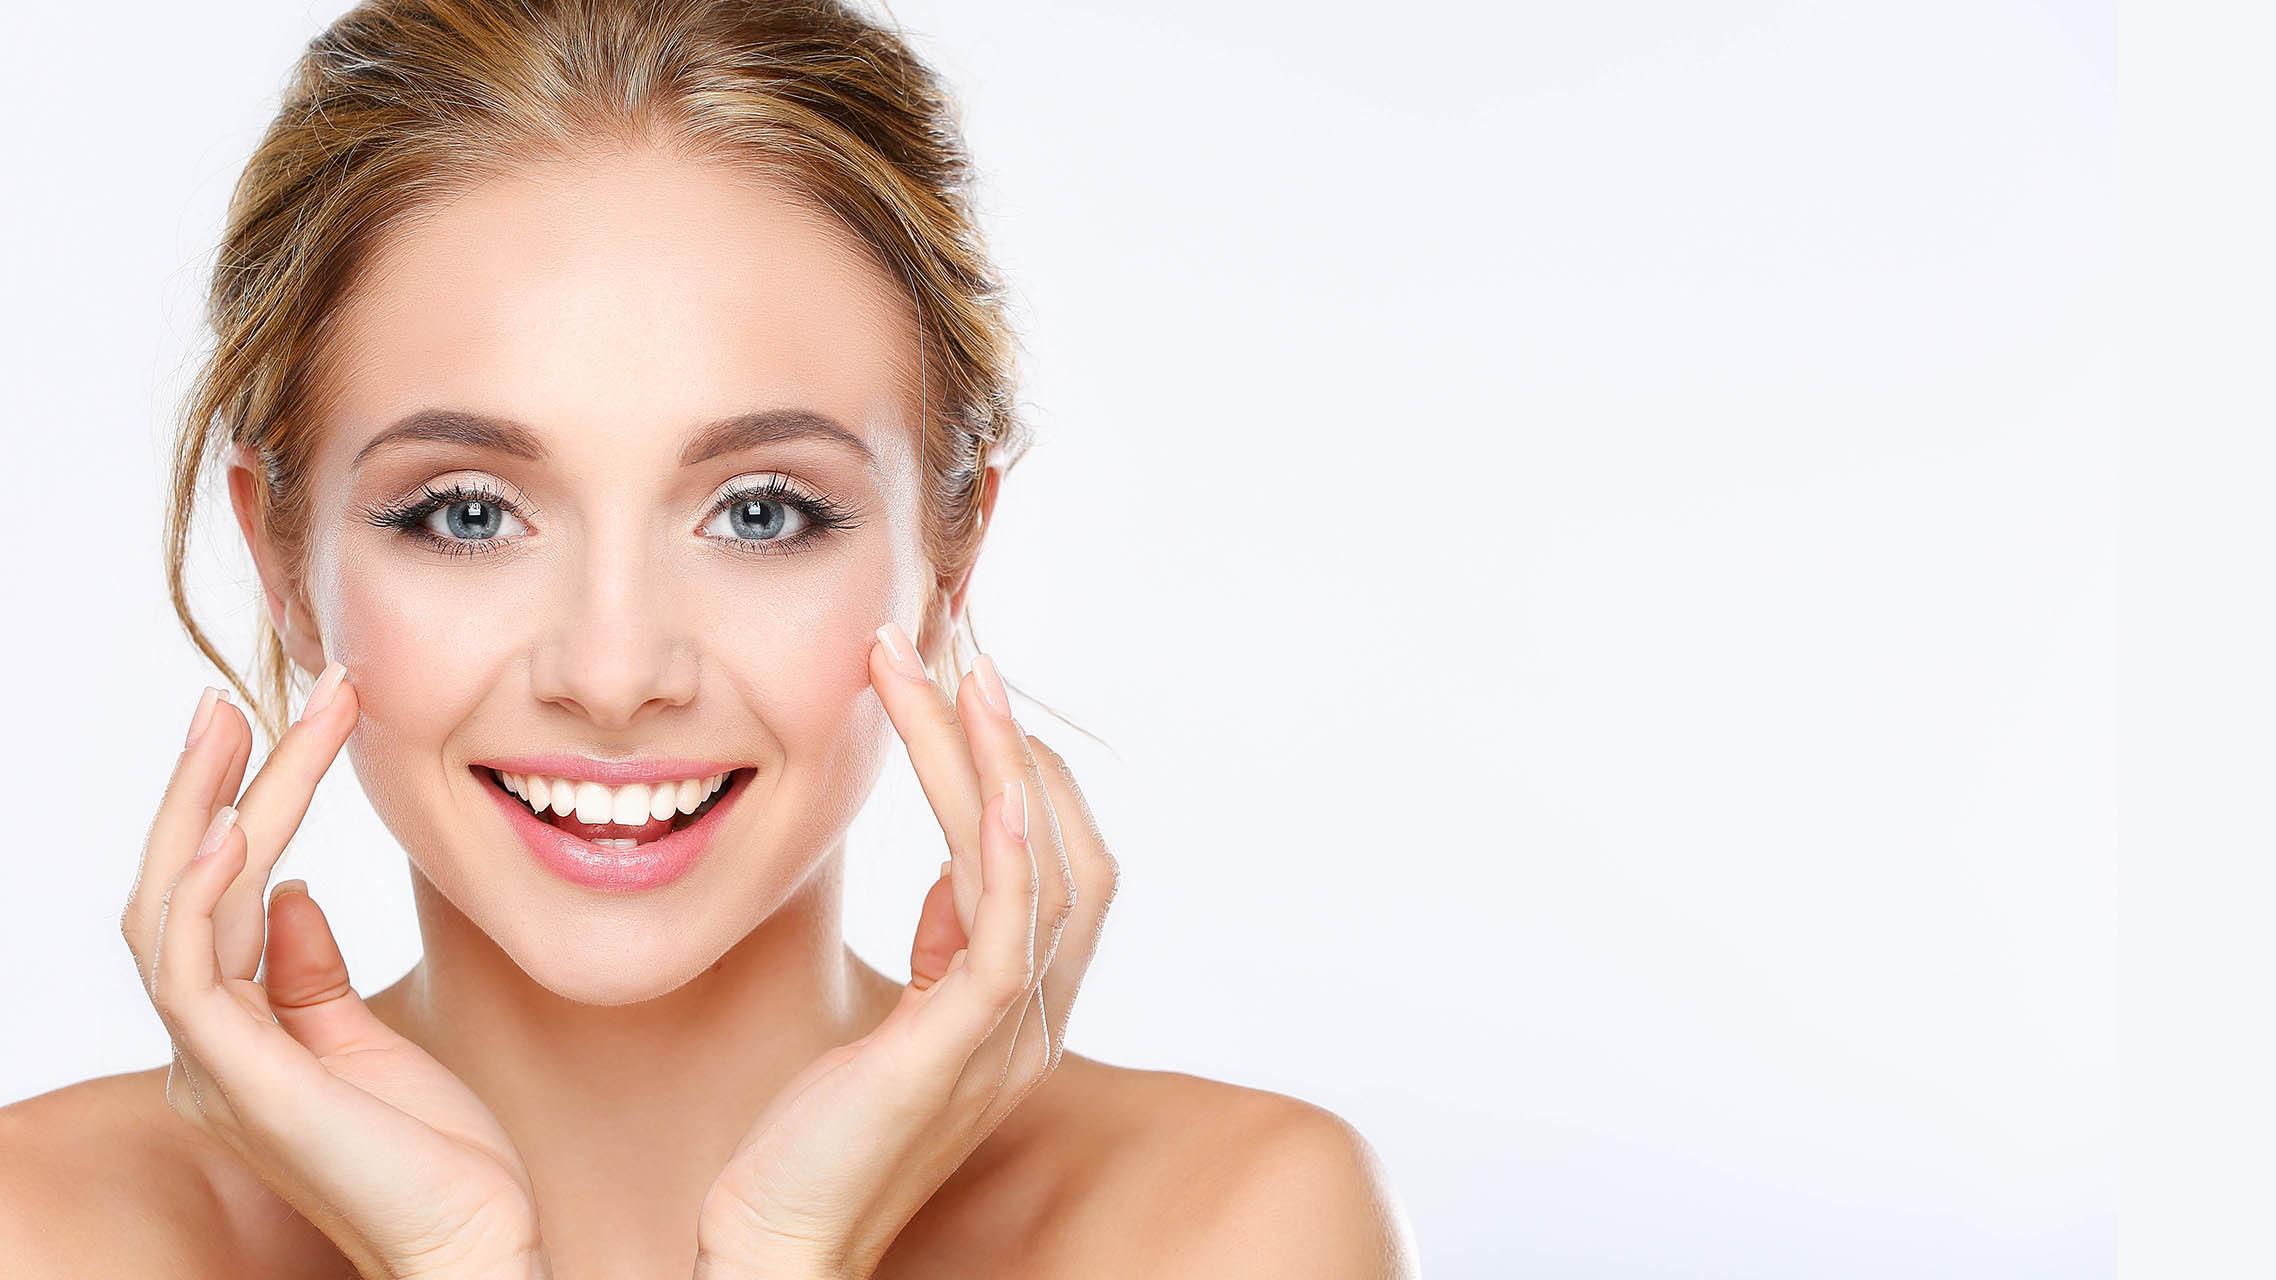 Young woman smiling glowing skin